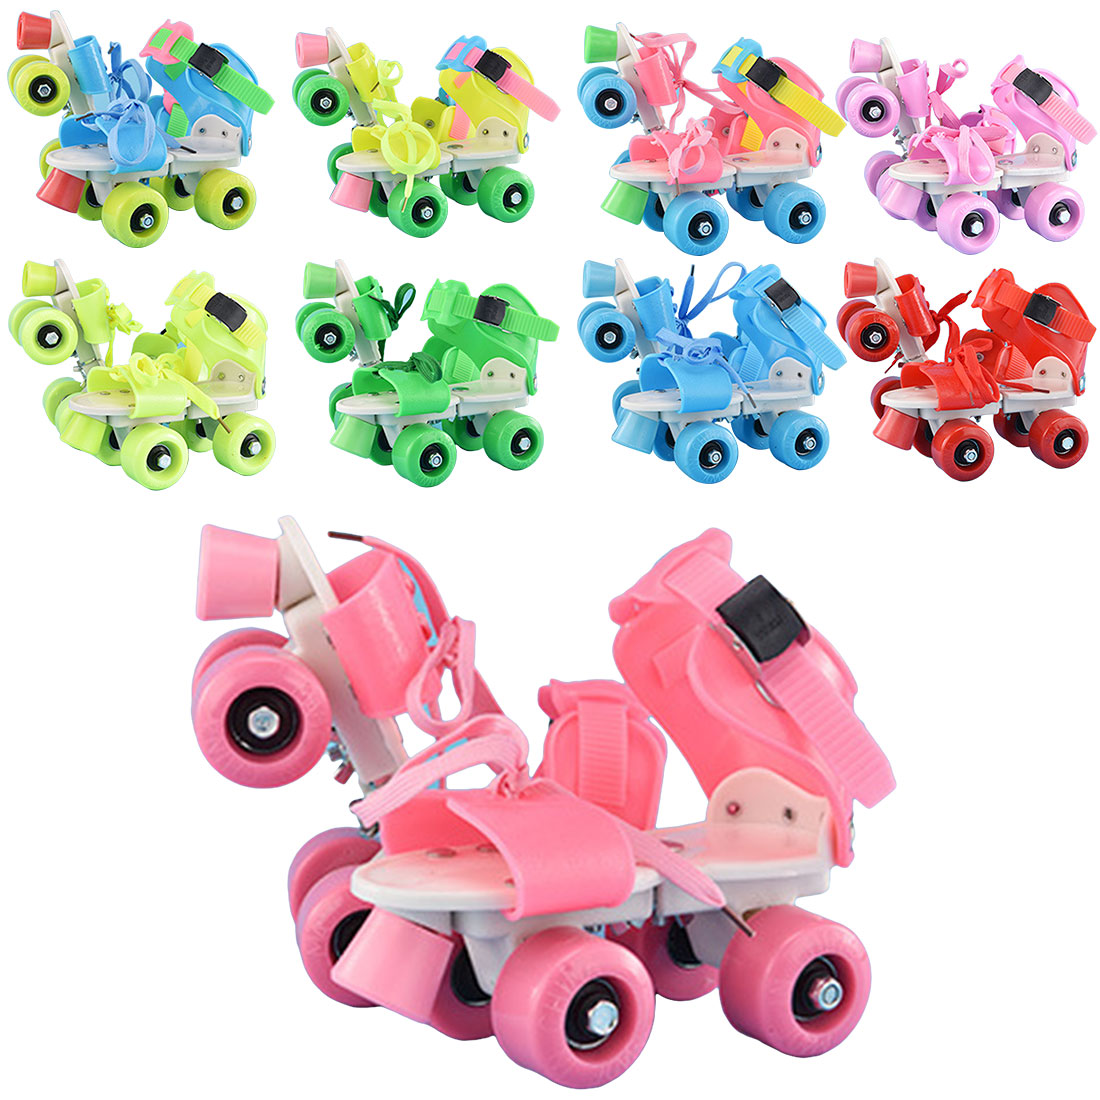 4 Wheels Children Roller Skates Double Row Adjustable Size Skating Shoes Sliding Slalom Inline Skates Kids